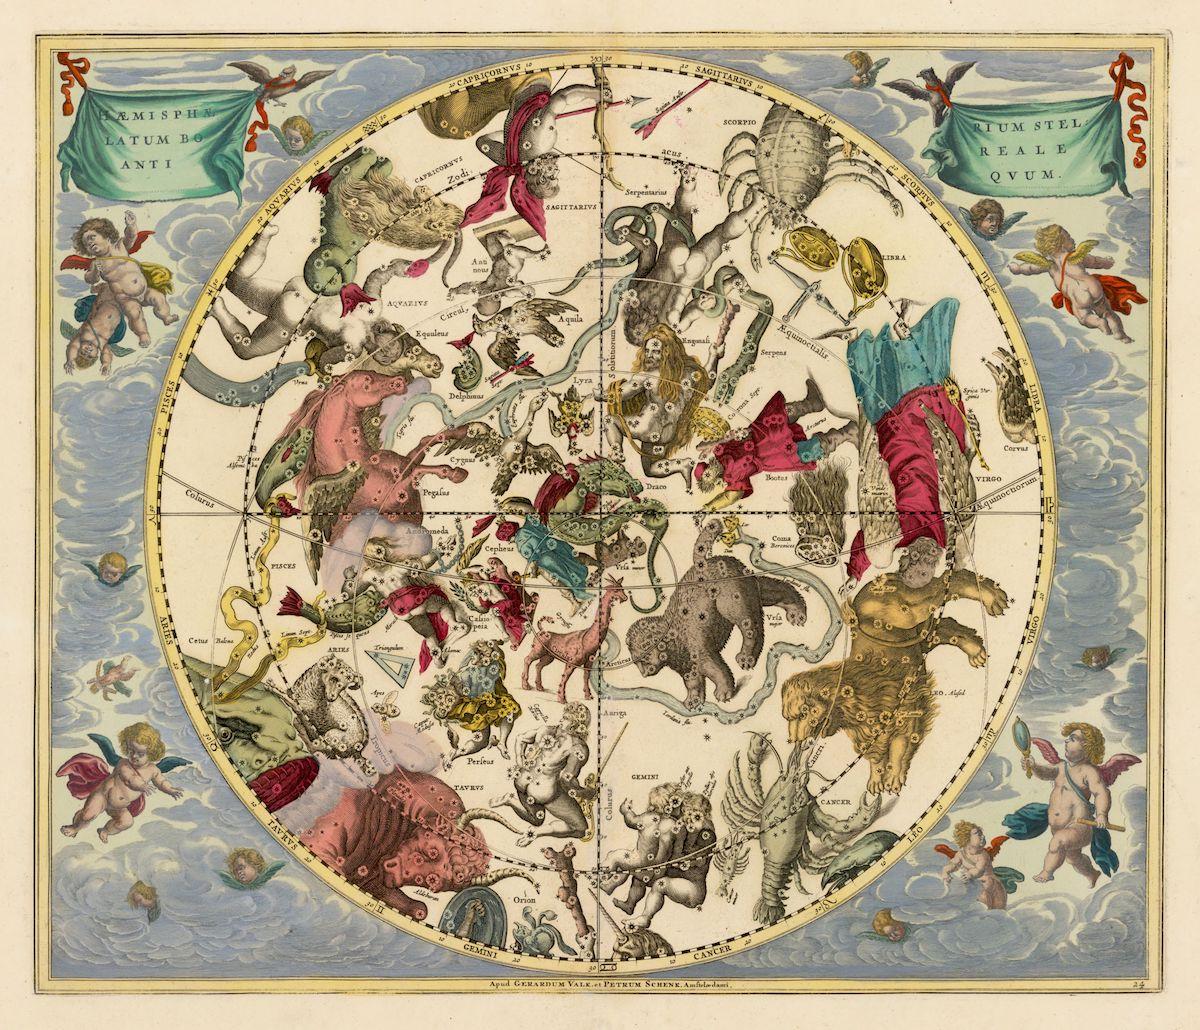 The Northern Stellar Hemisphere of Antiquity.